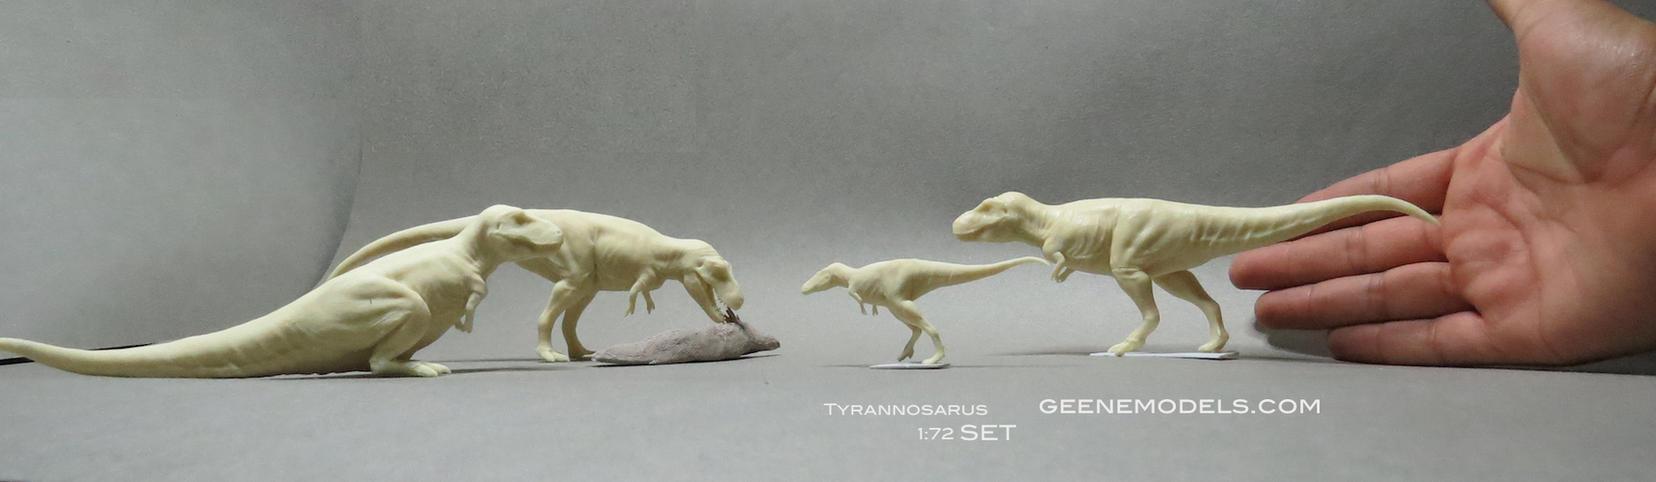 Tyrannosaurus Rex 1:72 scale set. by GalileoN